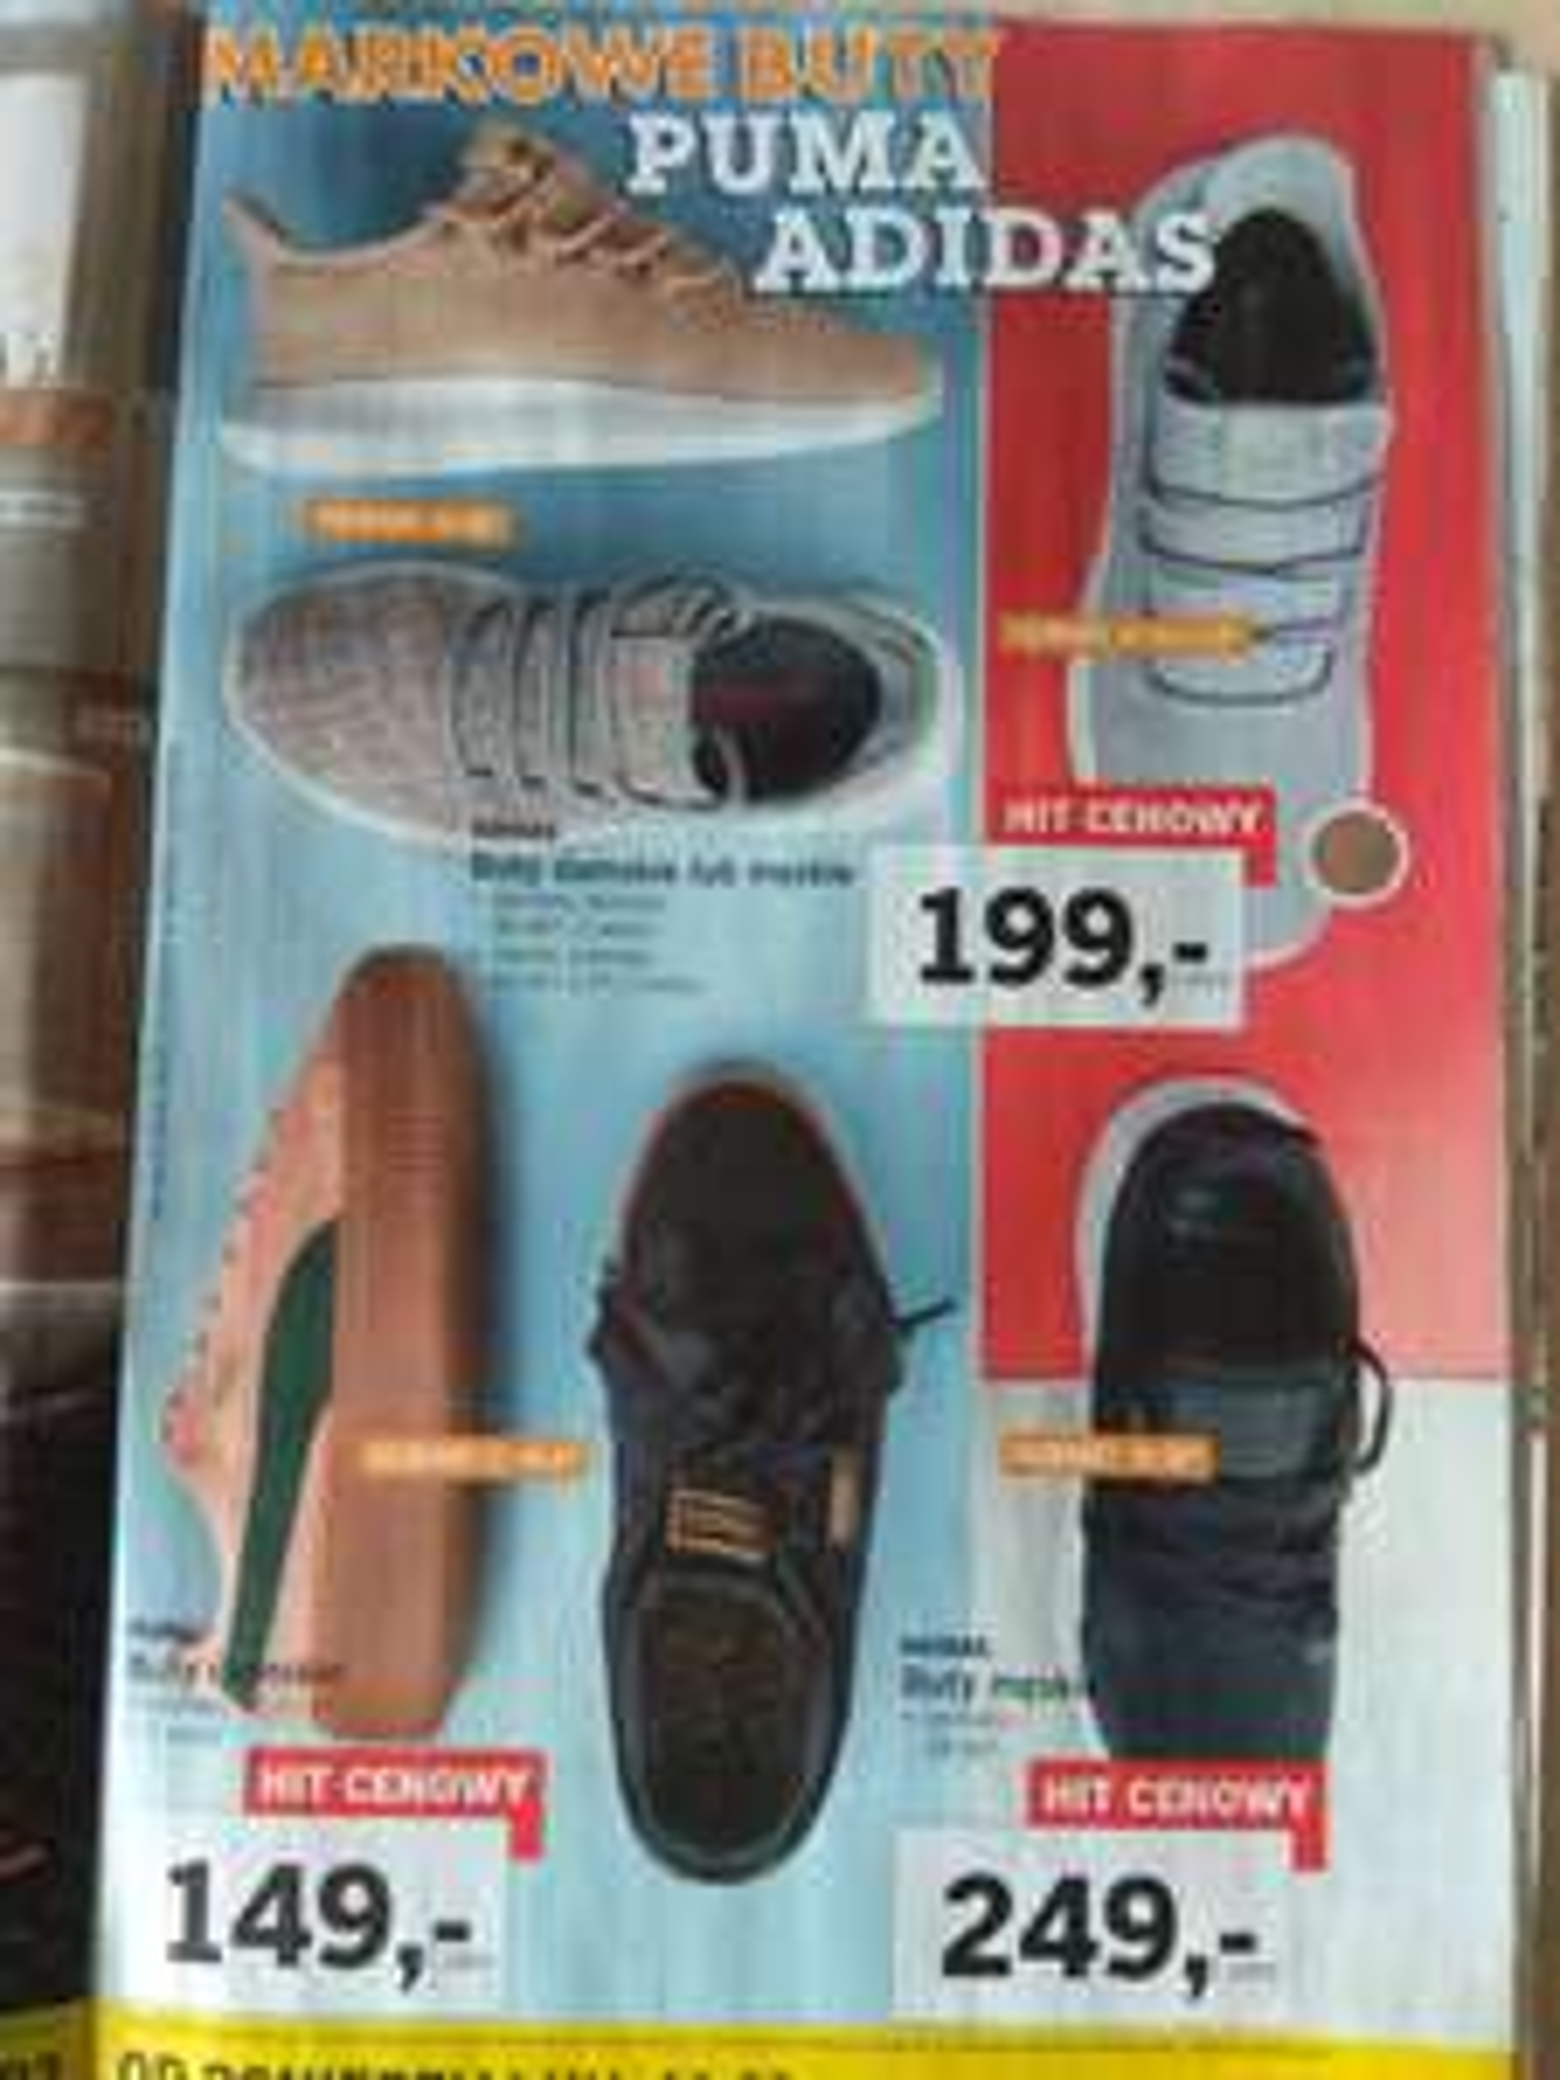 Buty adidas i puma w Lidlu